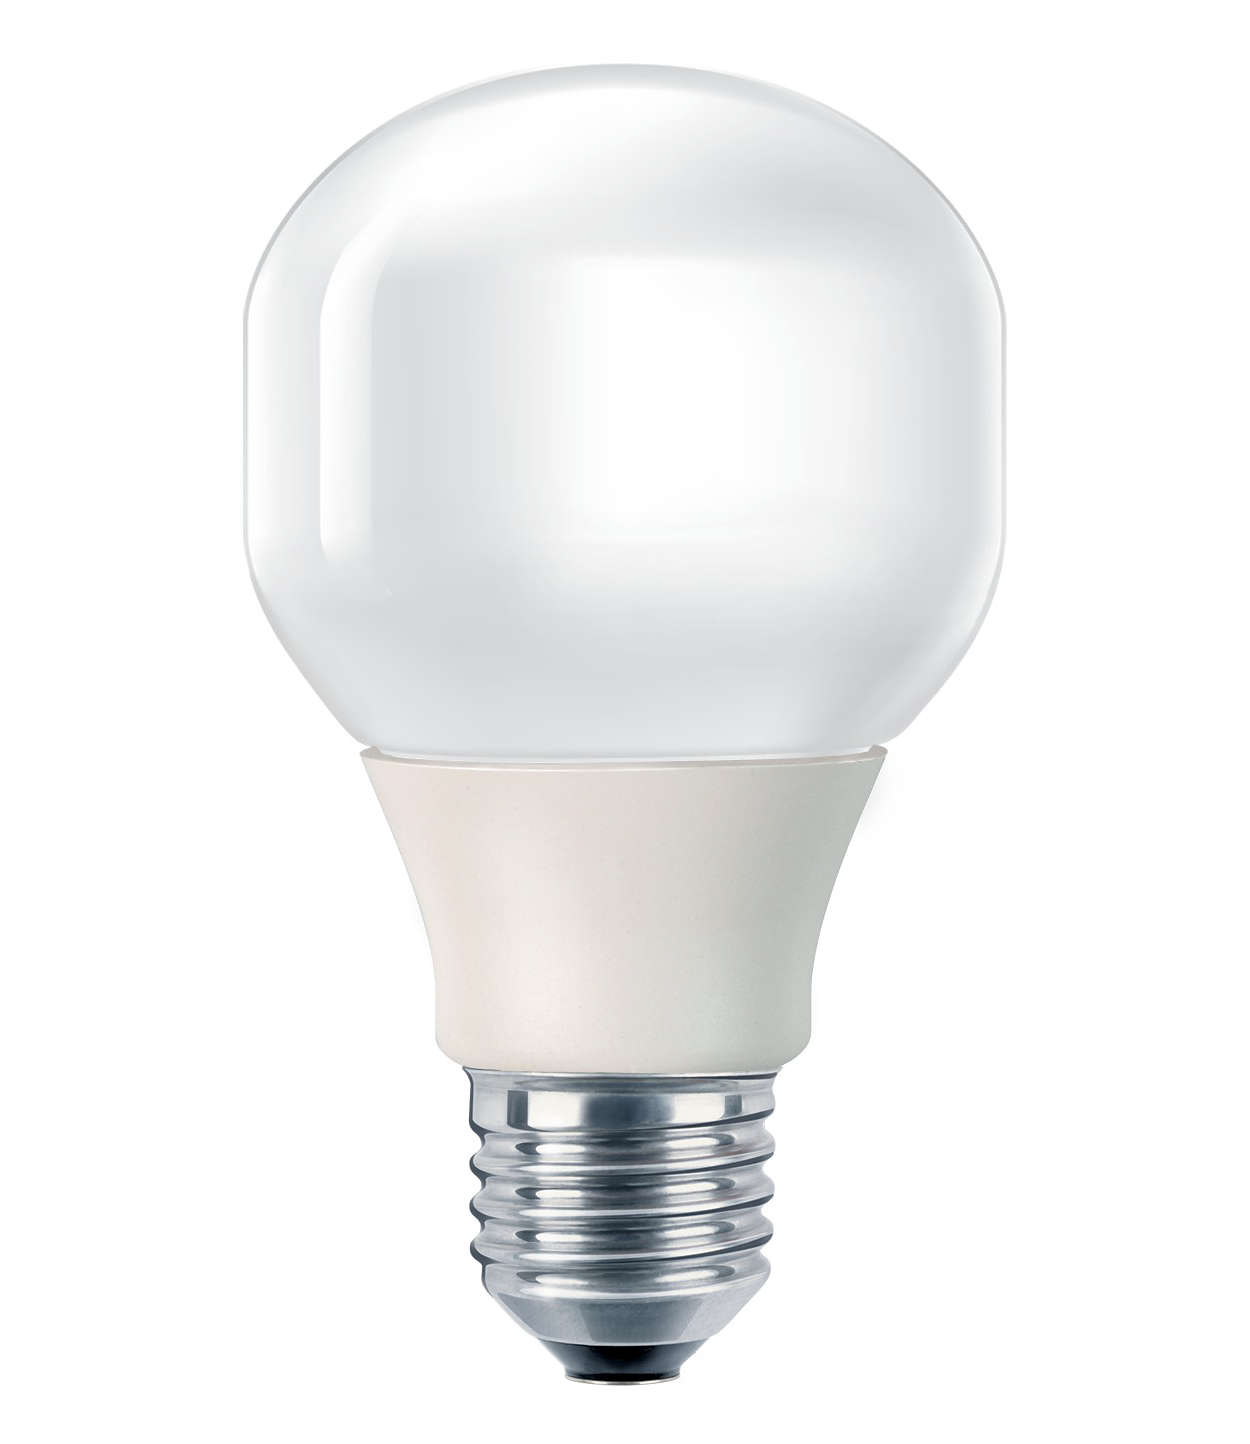 Softone Globe Energy Saving Bulb 872790026016810 Philips